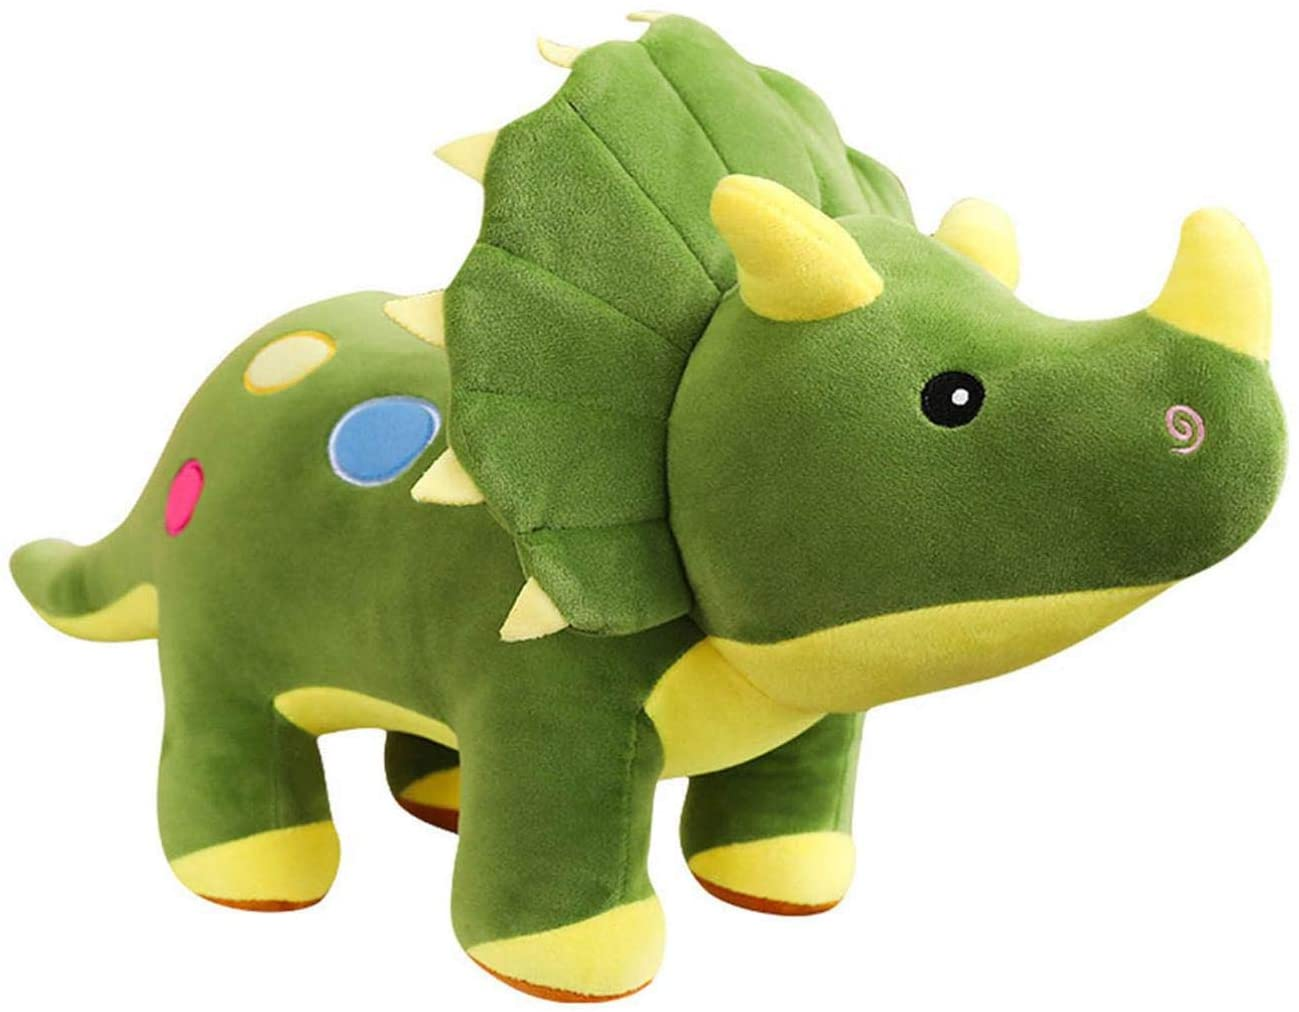 Cute Dinosaur Dolls Plush Toys Soft Stuffed Animal Adorable T-Rex Dolls Baby Accompany Toy Sleeping Doll for Home Pillow Decor